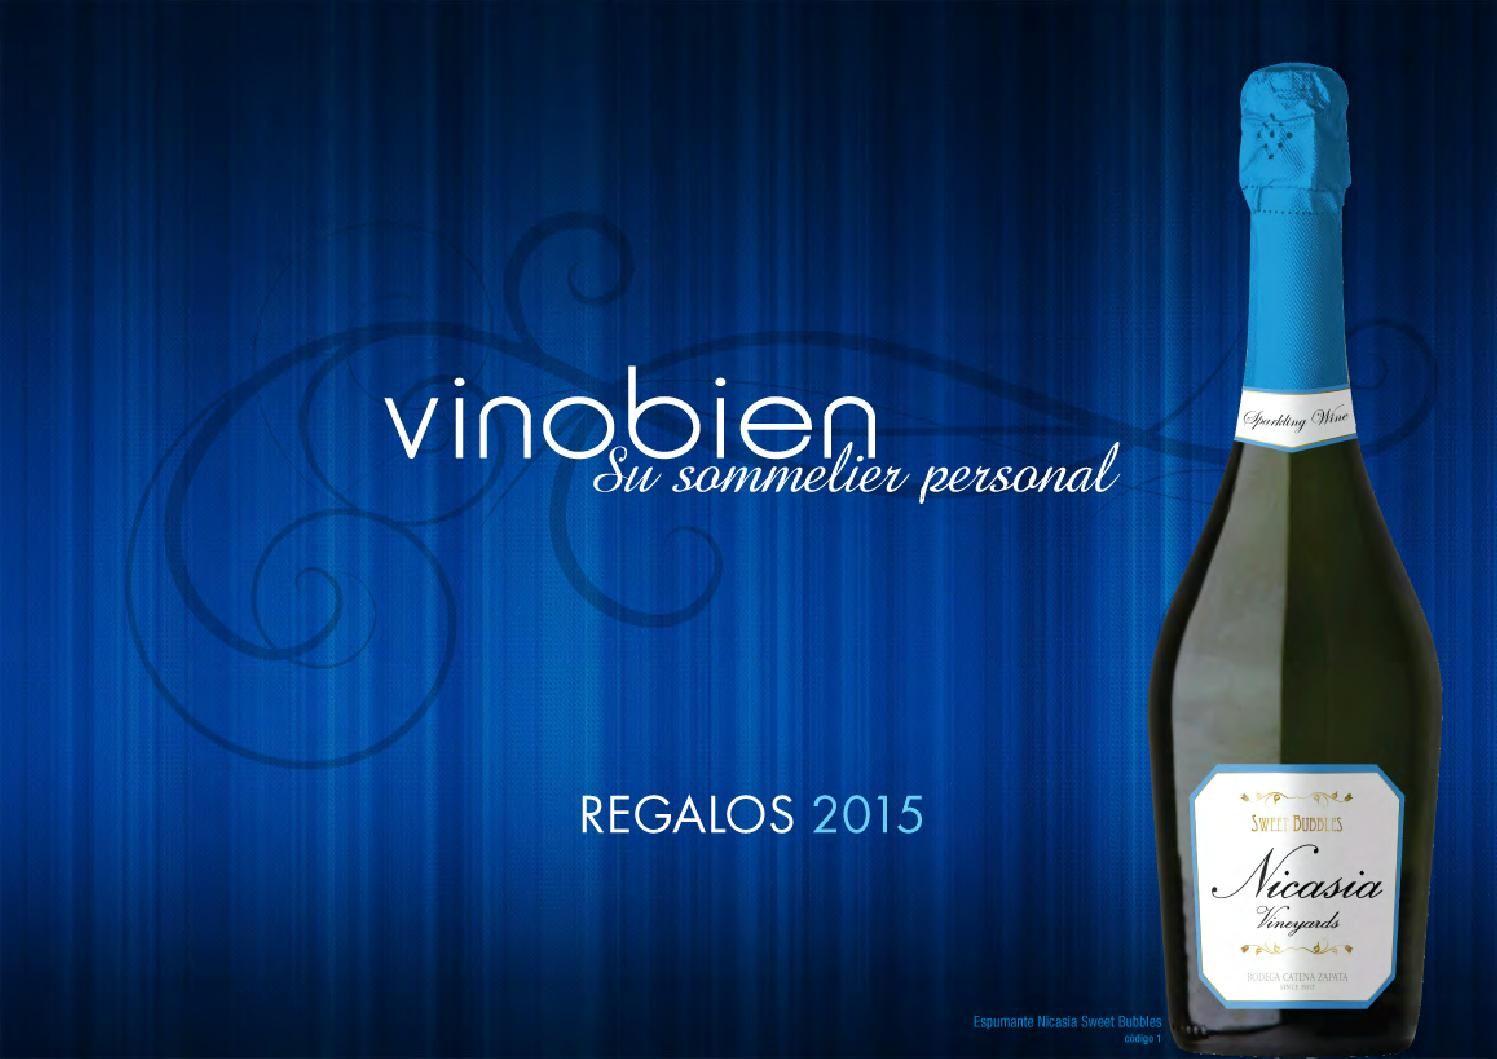 Catalogo vinobien 2015